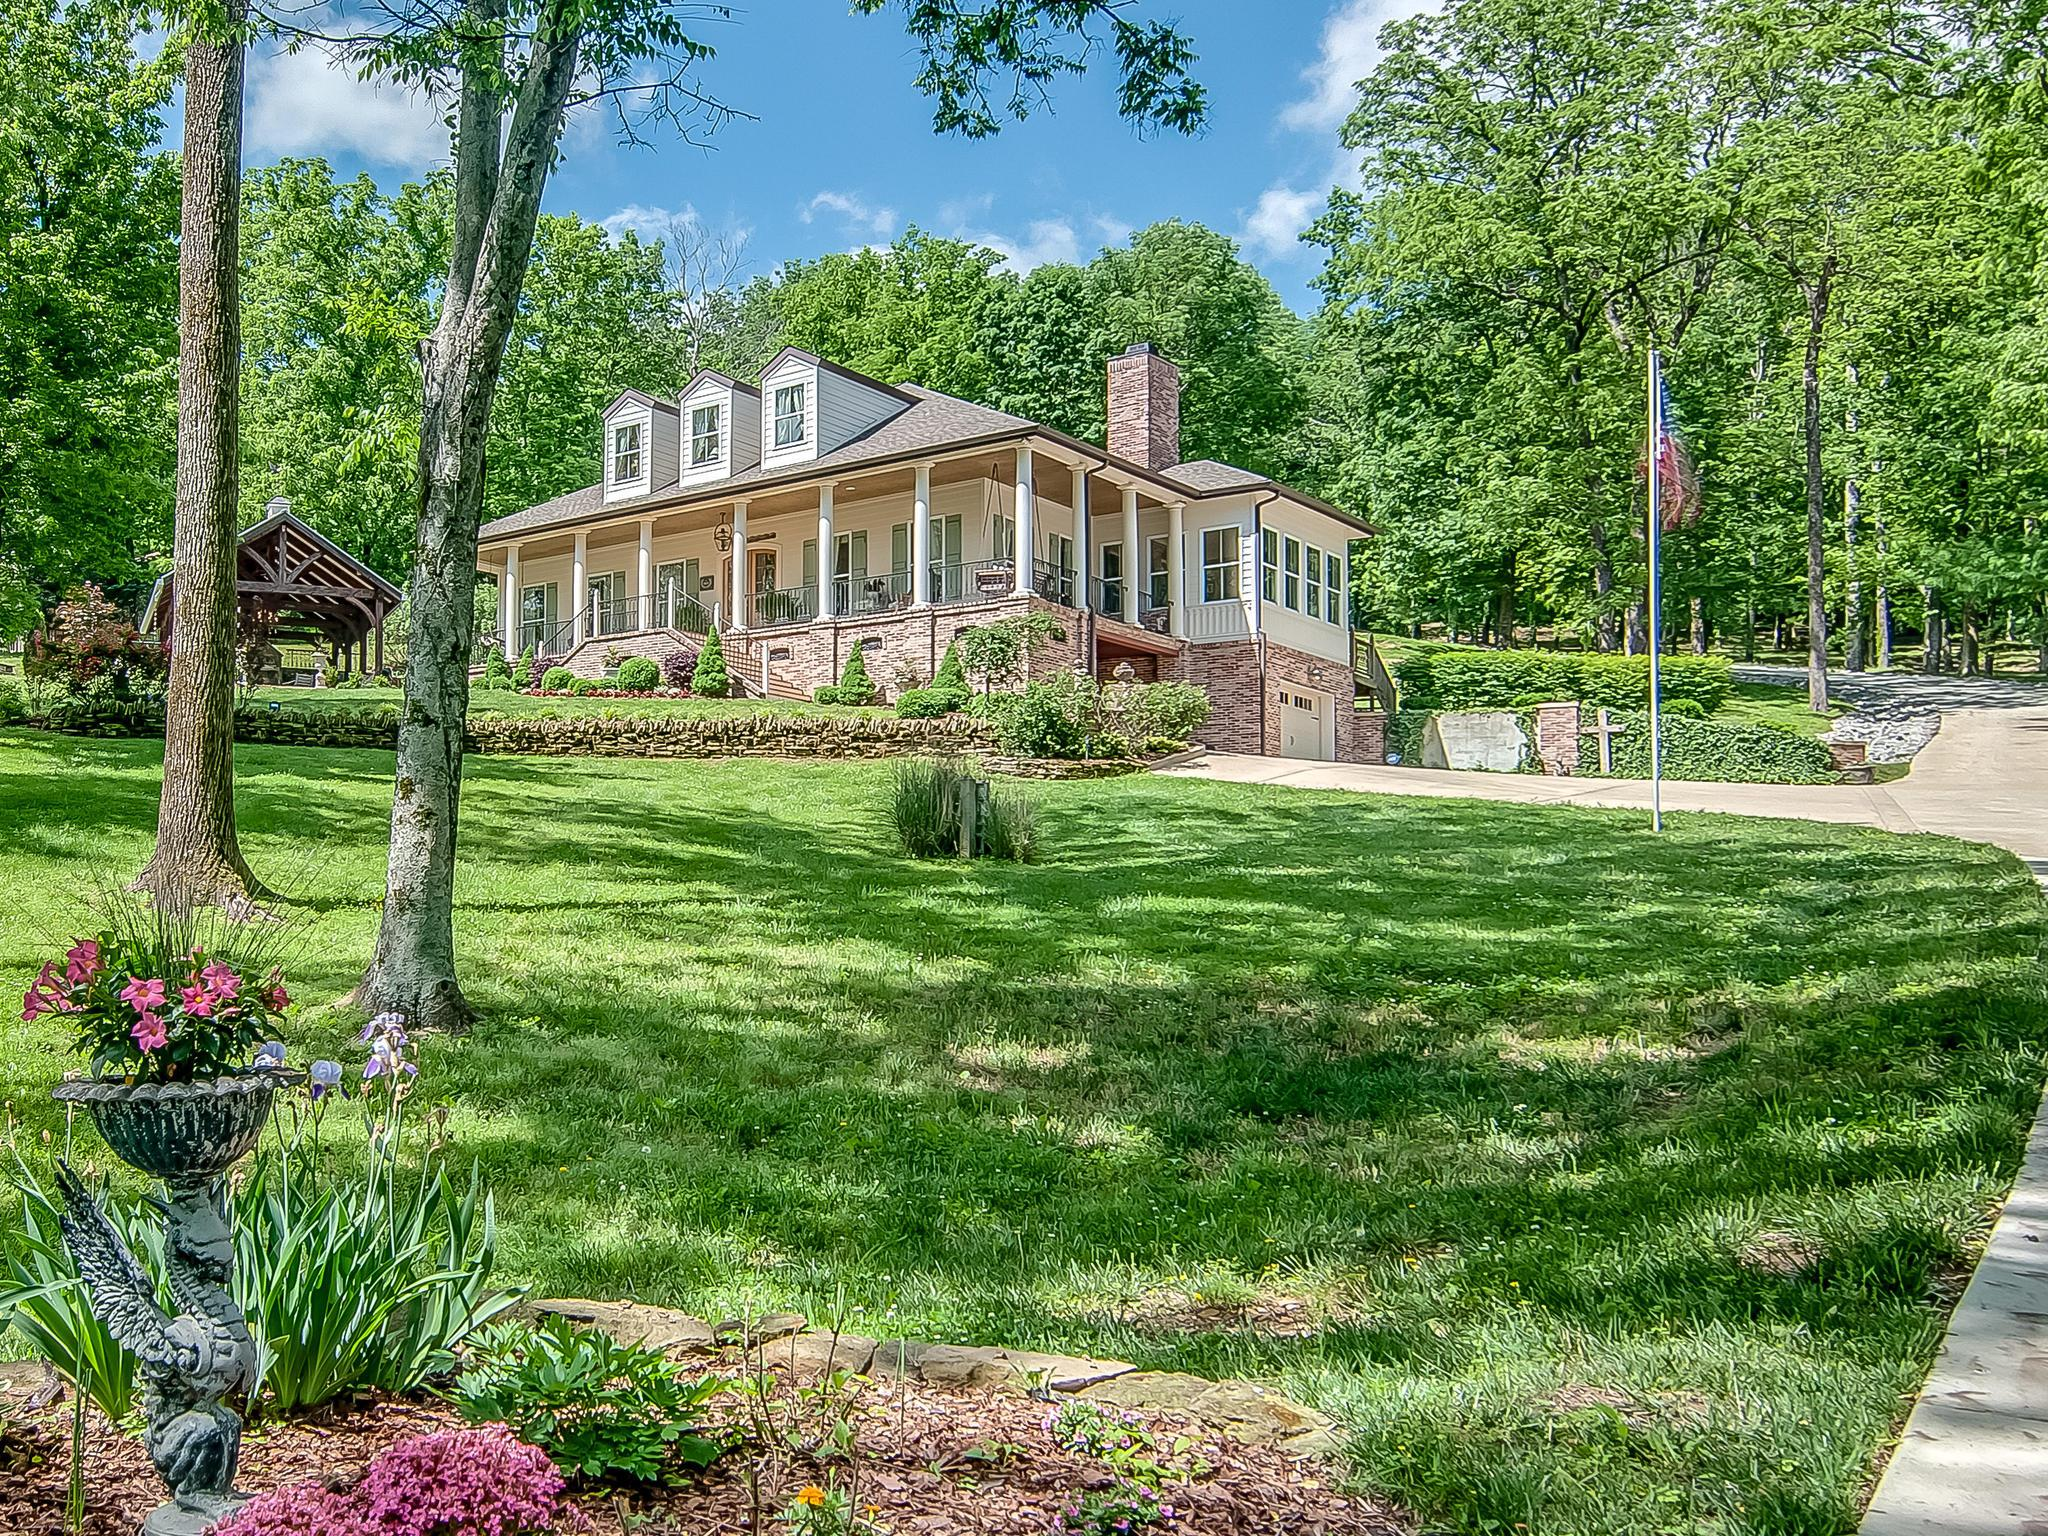 4289 Peytonsville Trinity Rd, Franklin, TN 37064 - Franklin, TN real estate listing